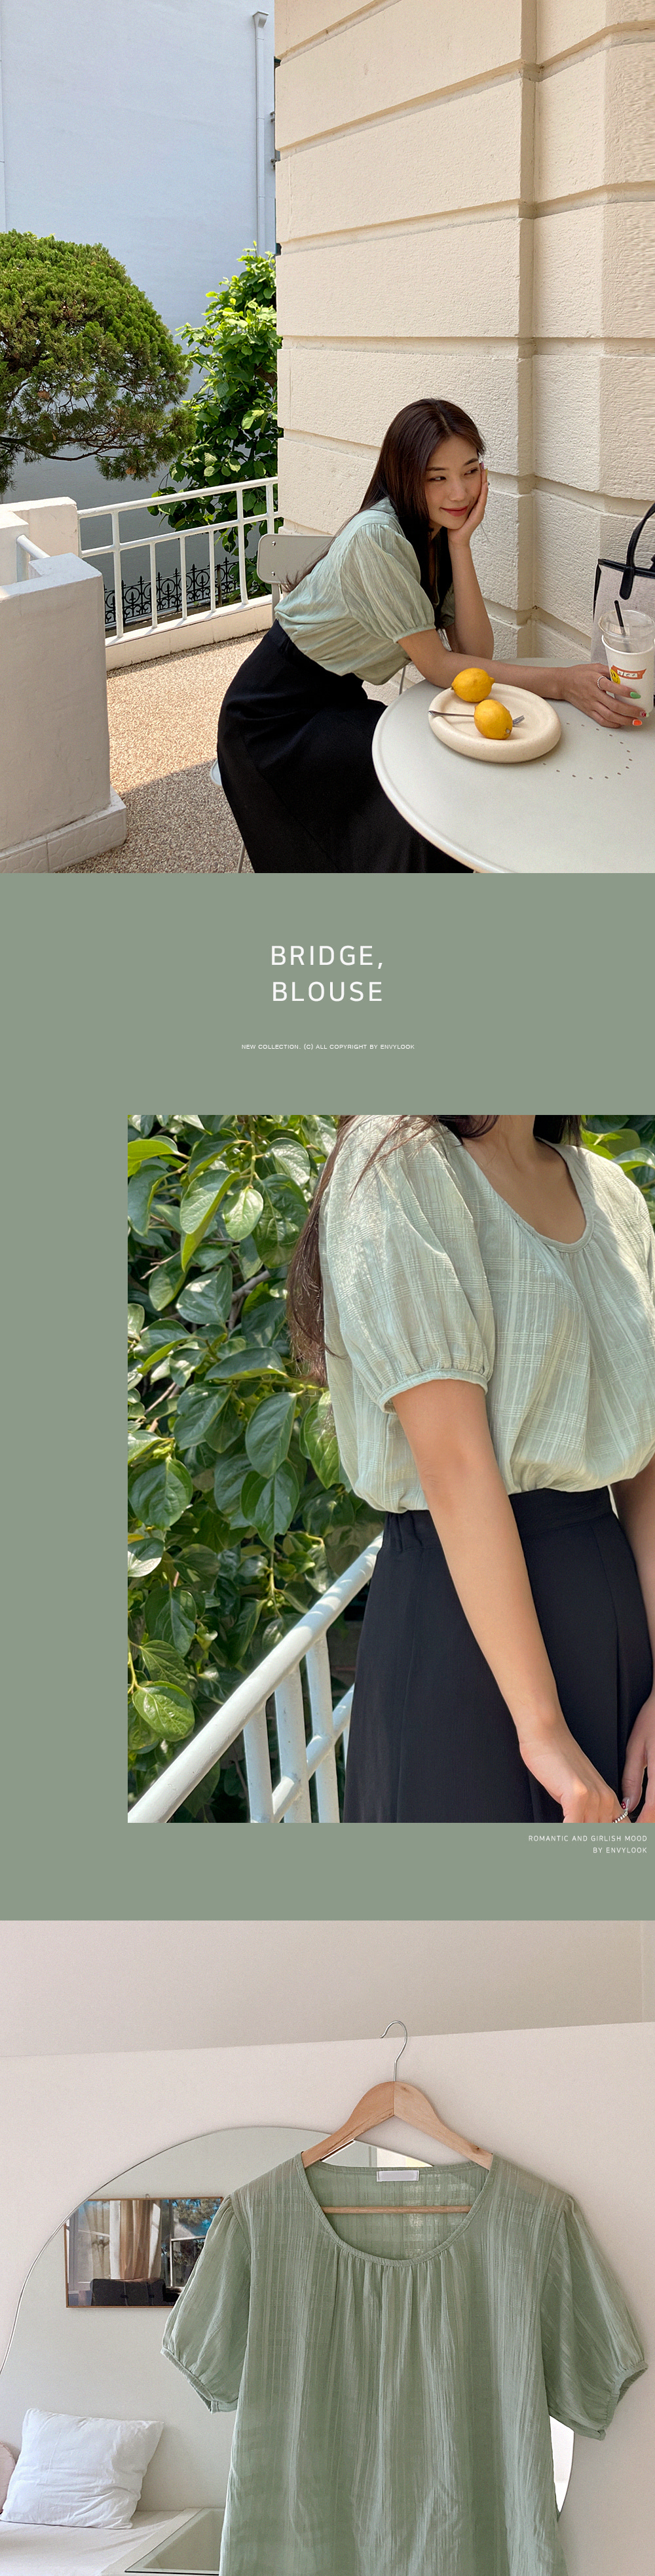 bridge blouse